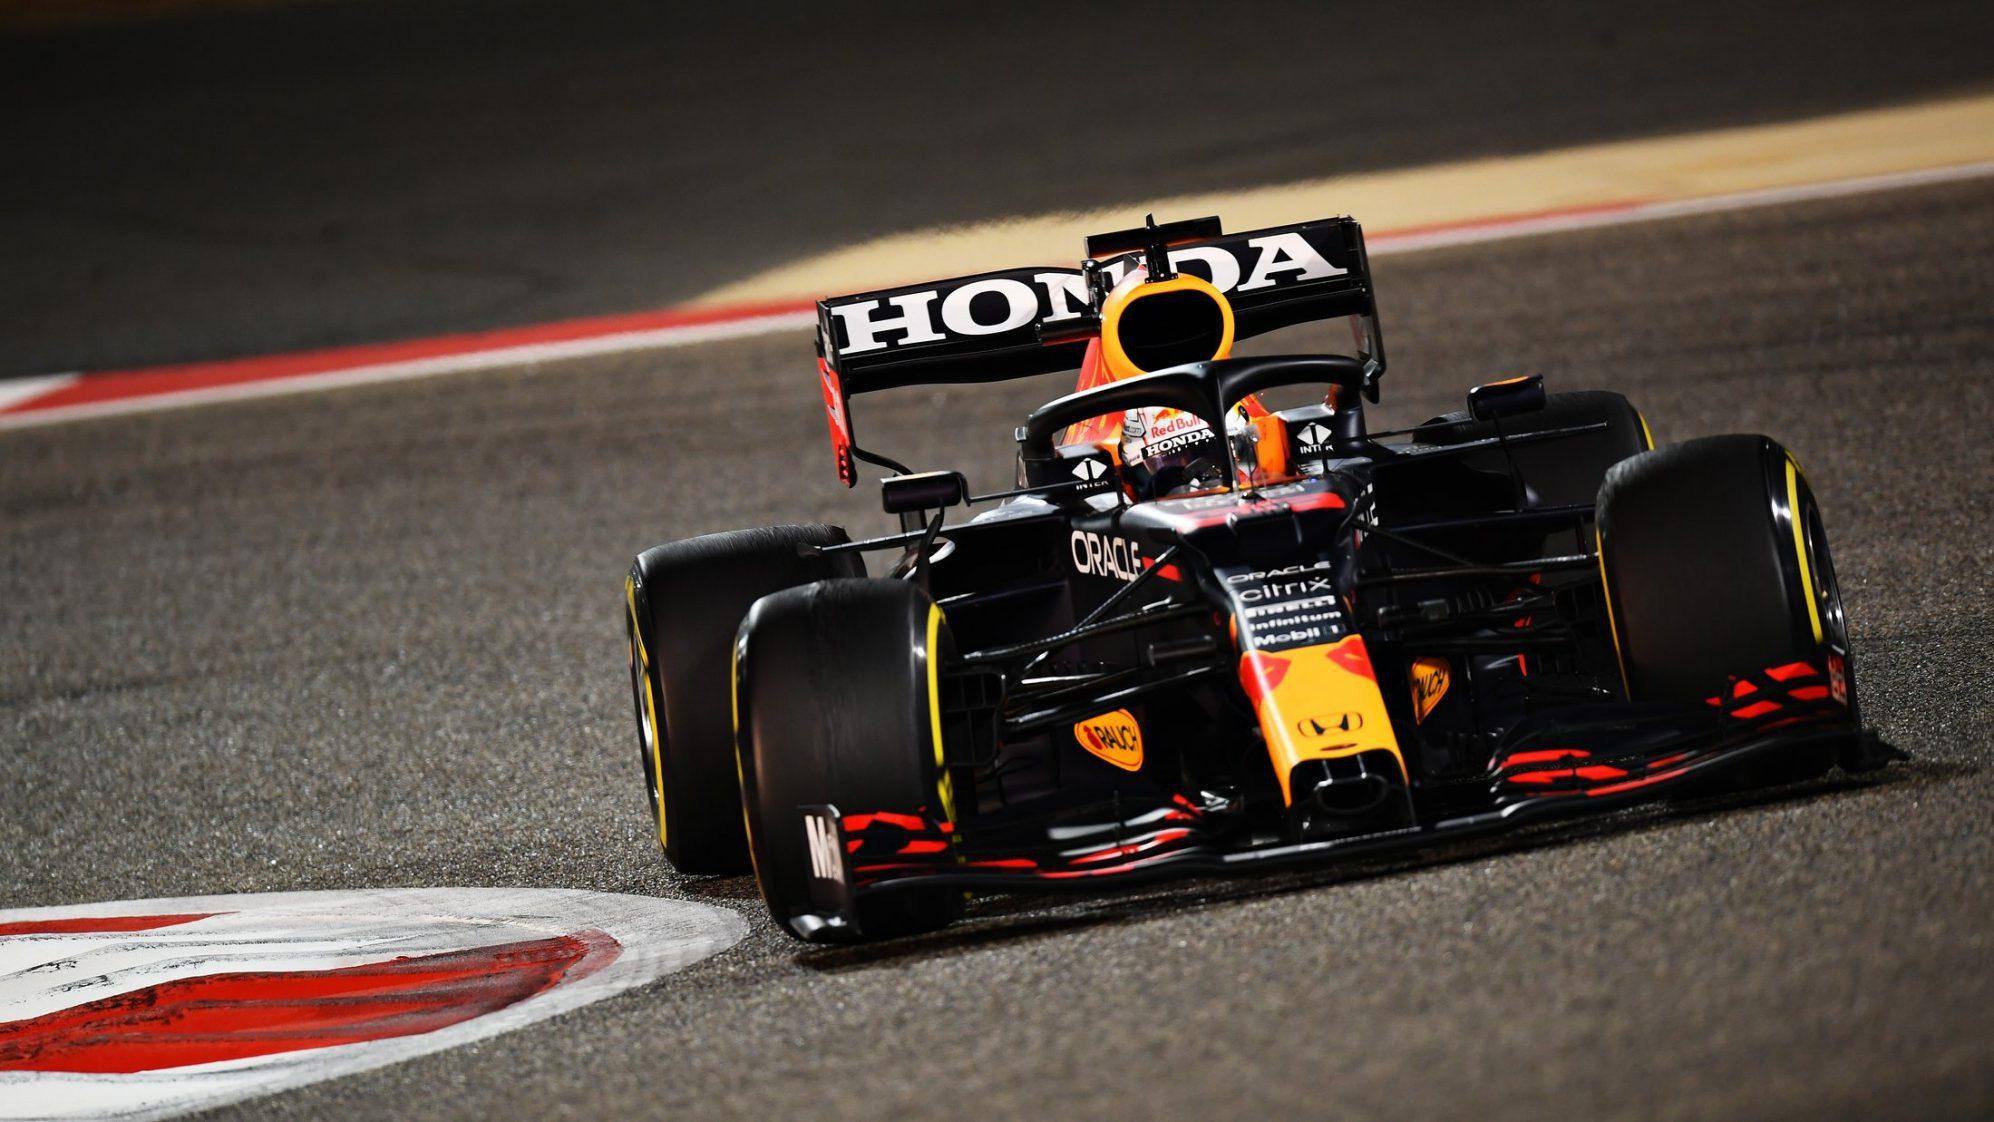 Why is Honda leaving F1